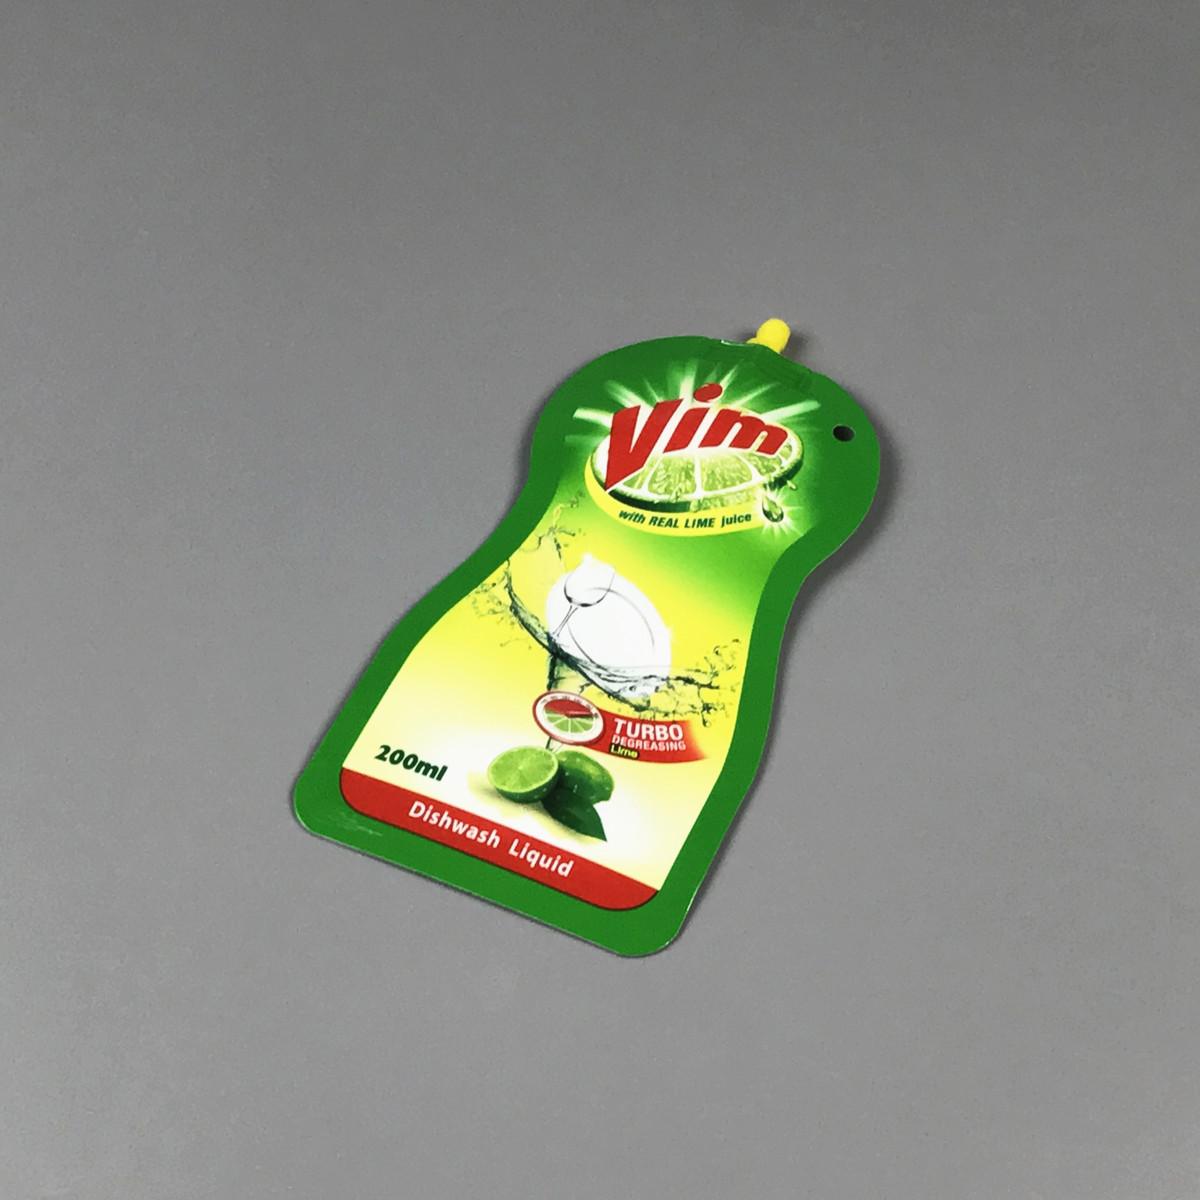 Nylon bag for washing-up liquid